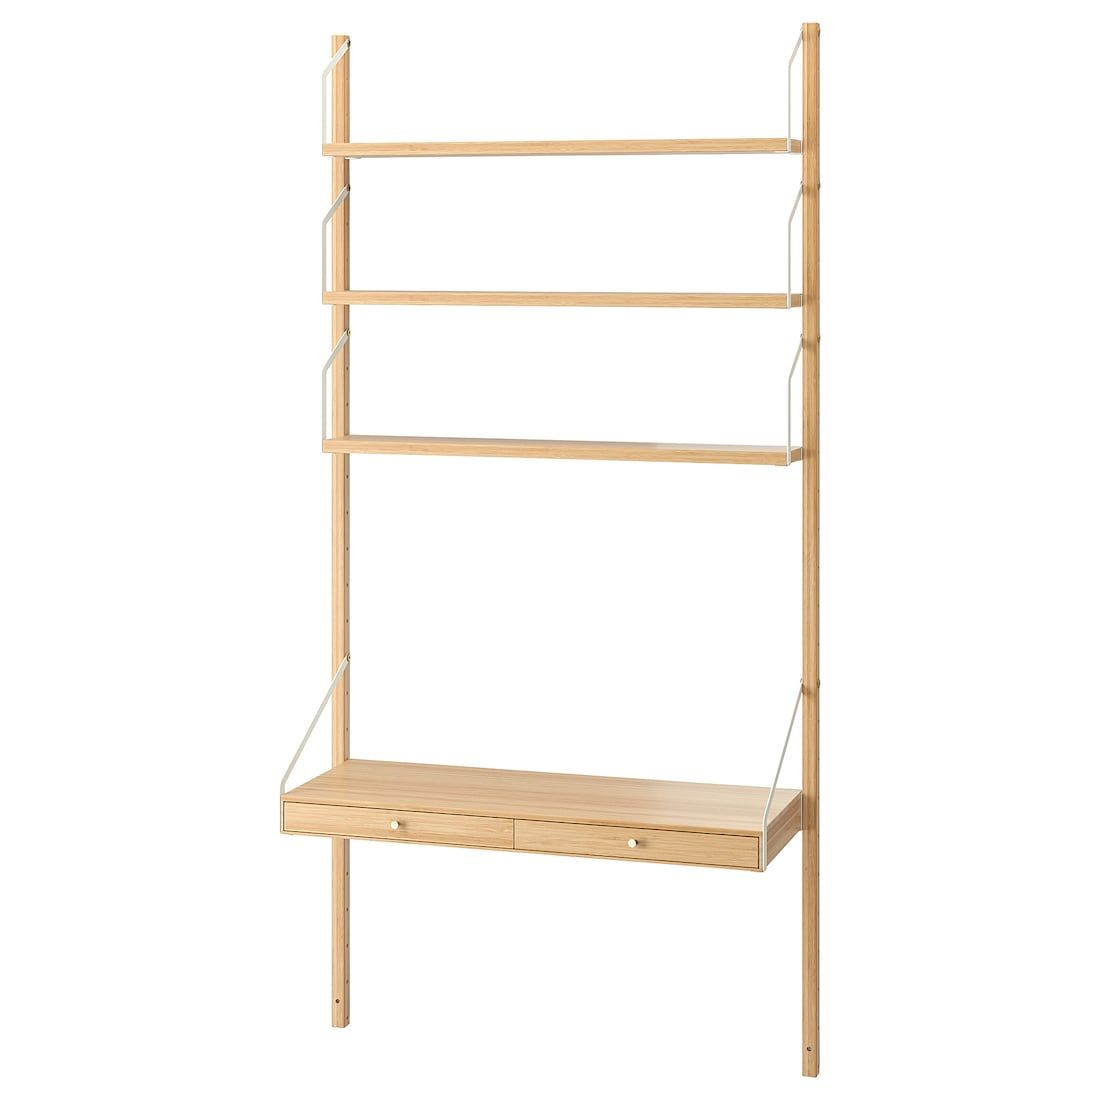 Svalnas Wall Mounted Storage Combination Bamboo 33 7 8x13 3 4x69